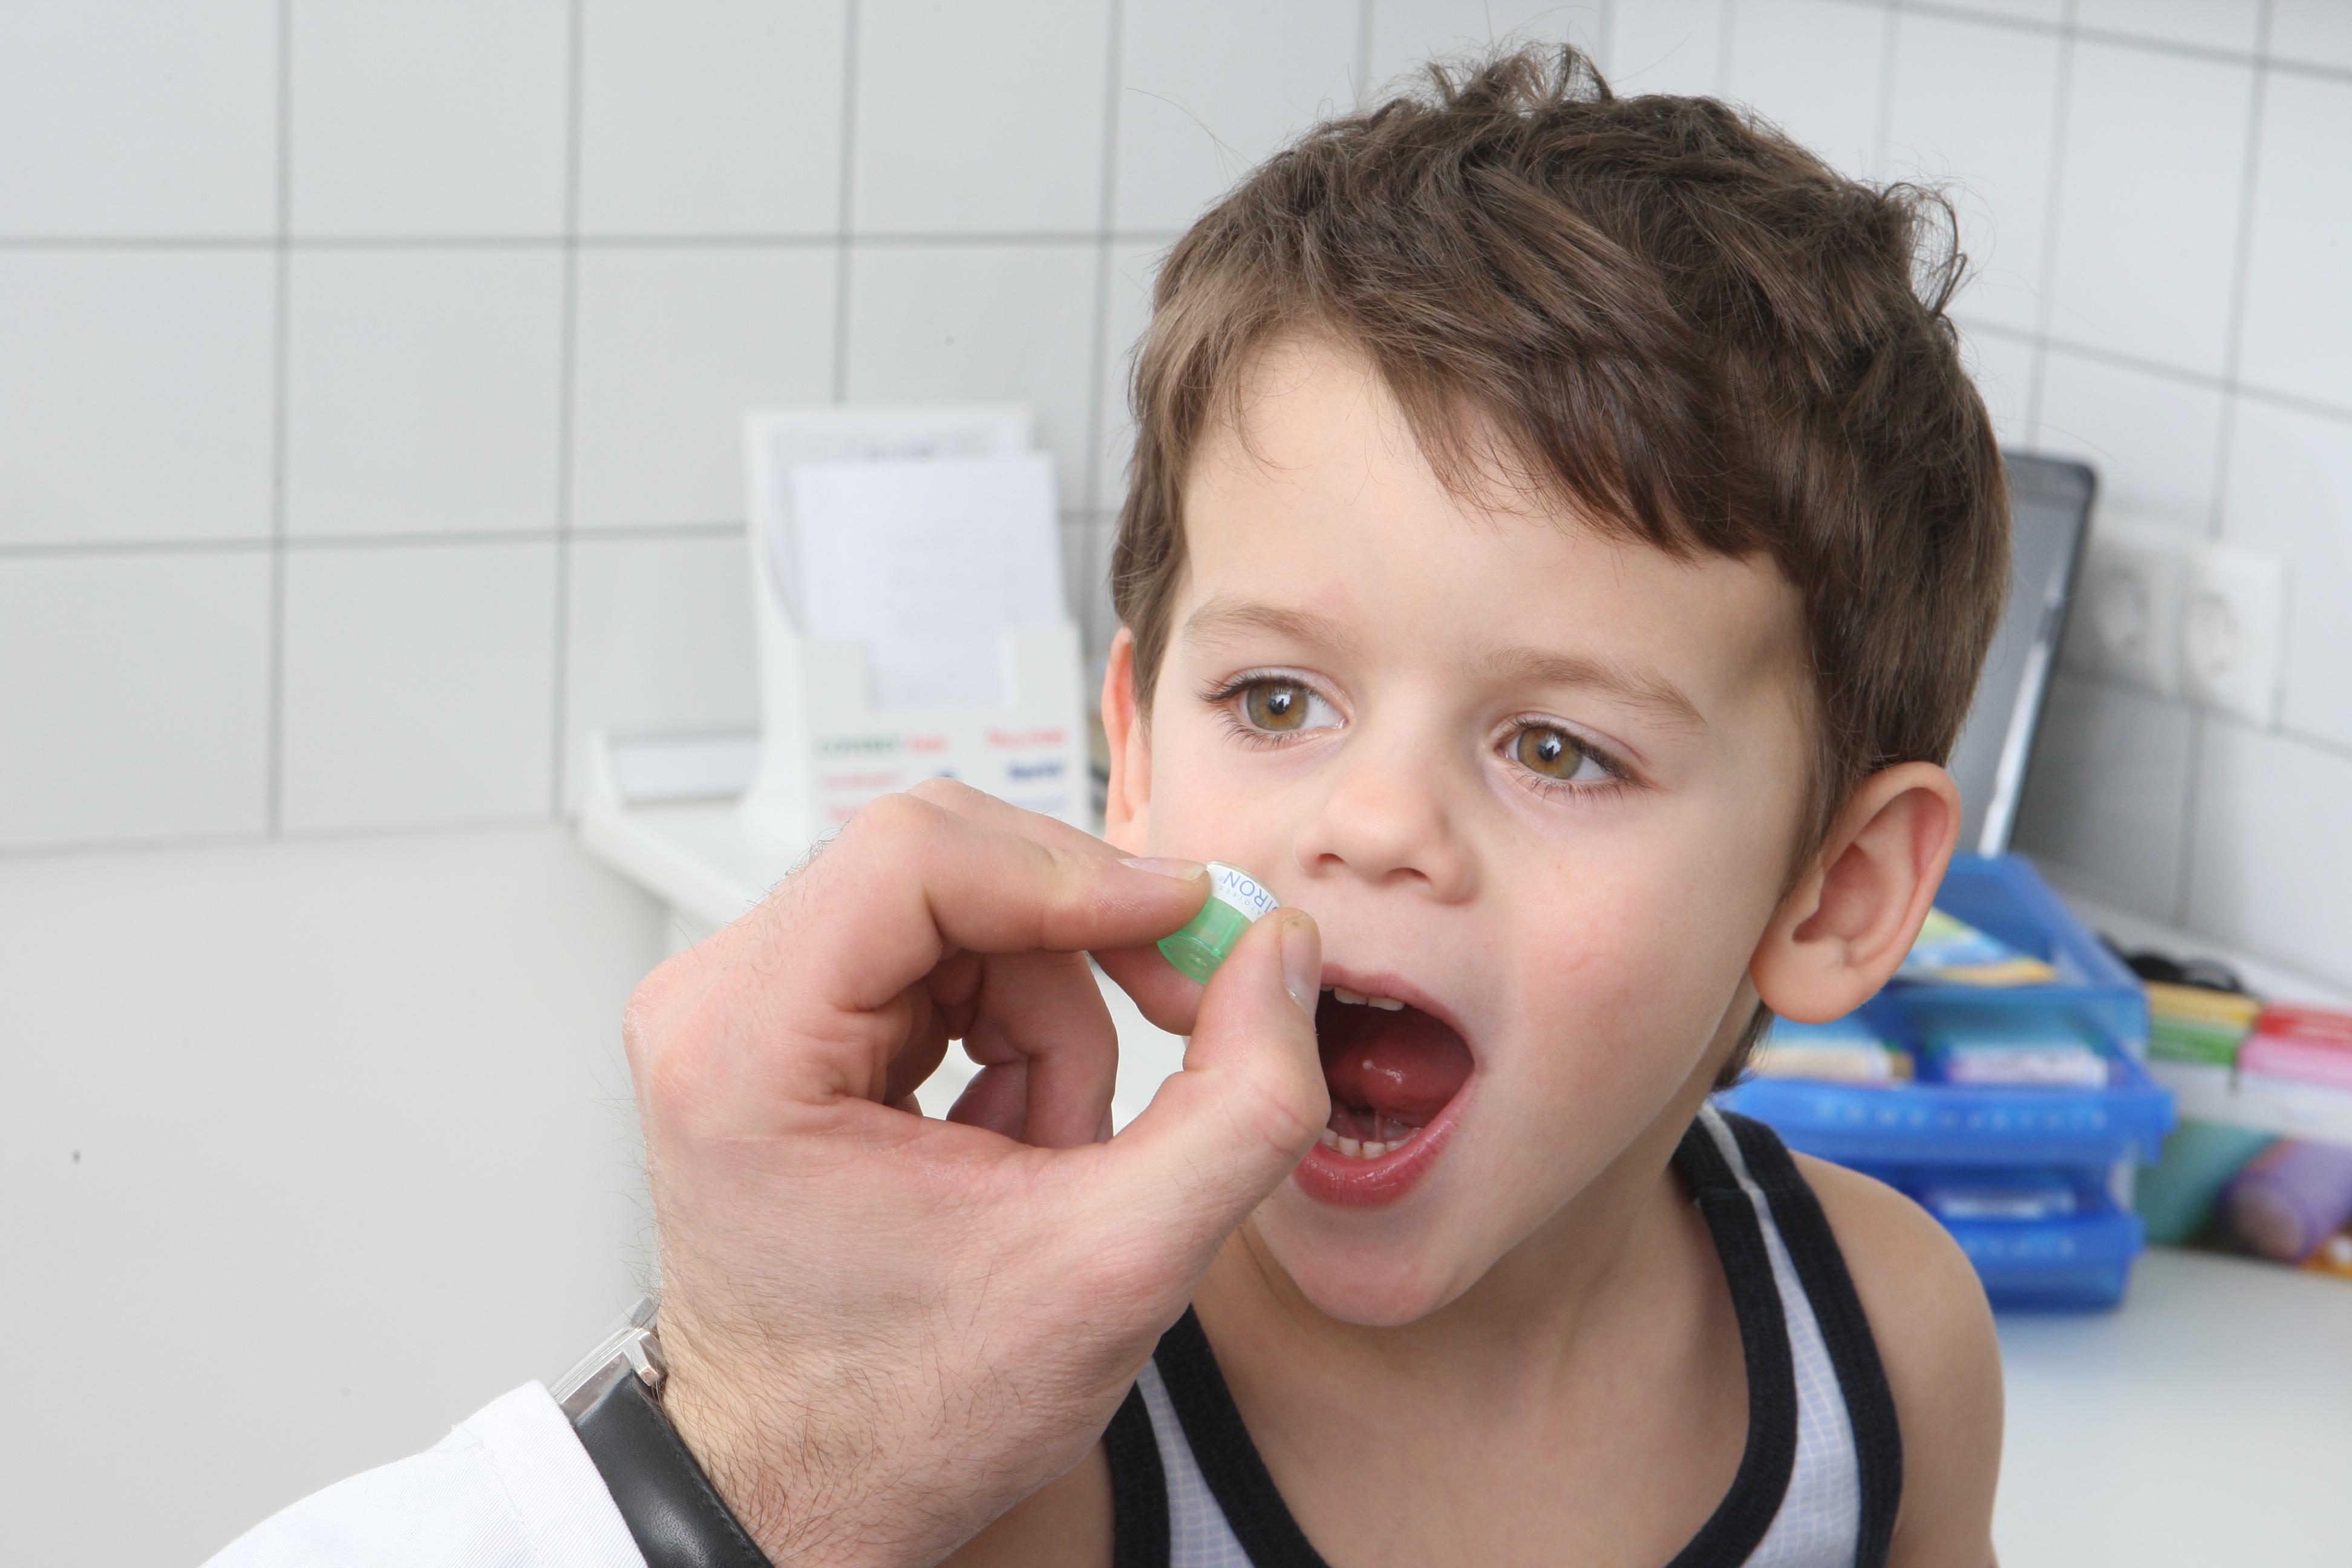 врач дает ребенку таблетки